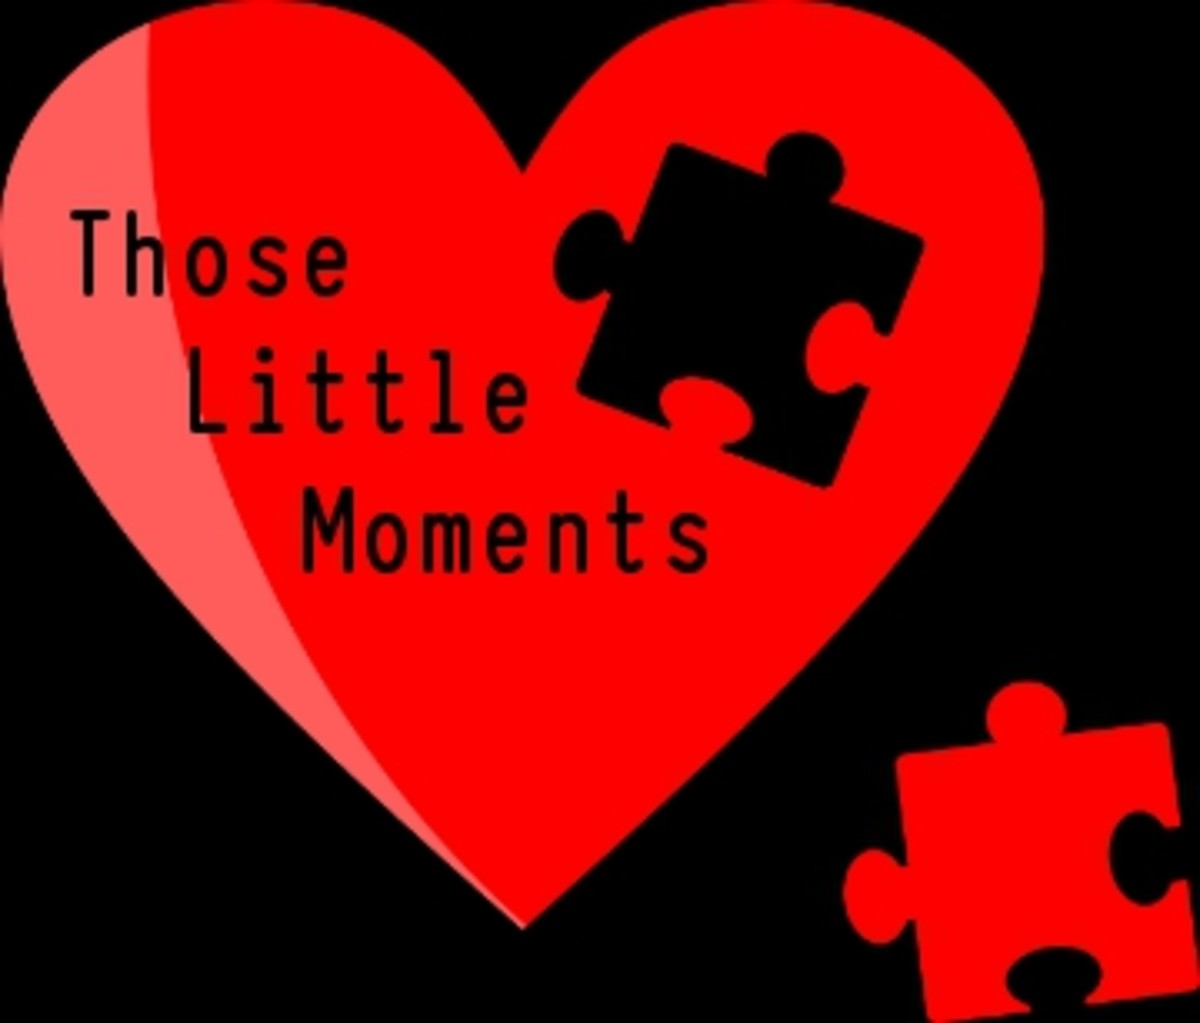 Poem:  Those Little Moments